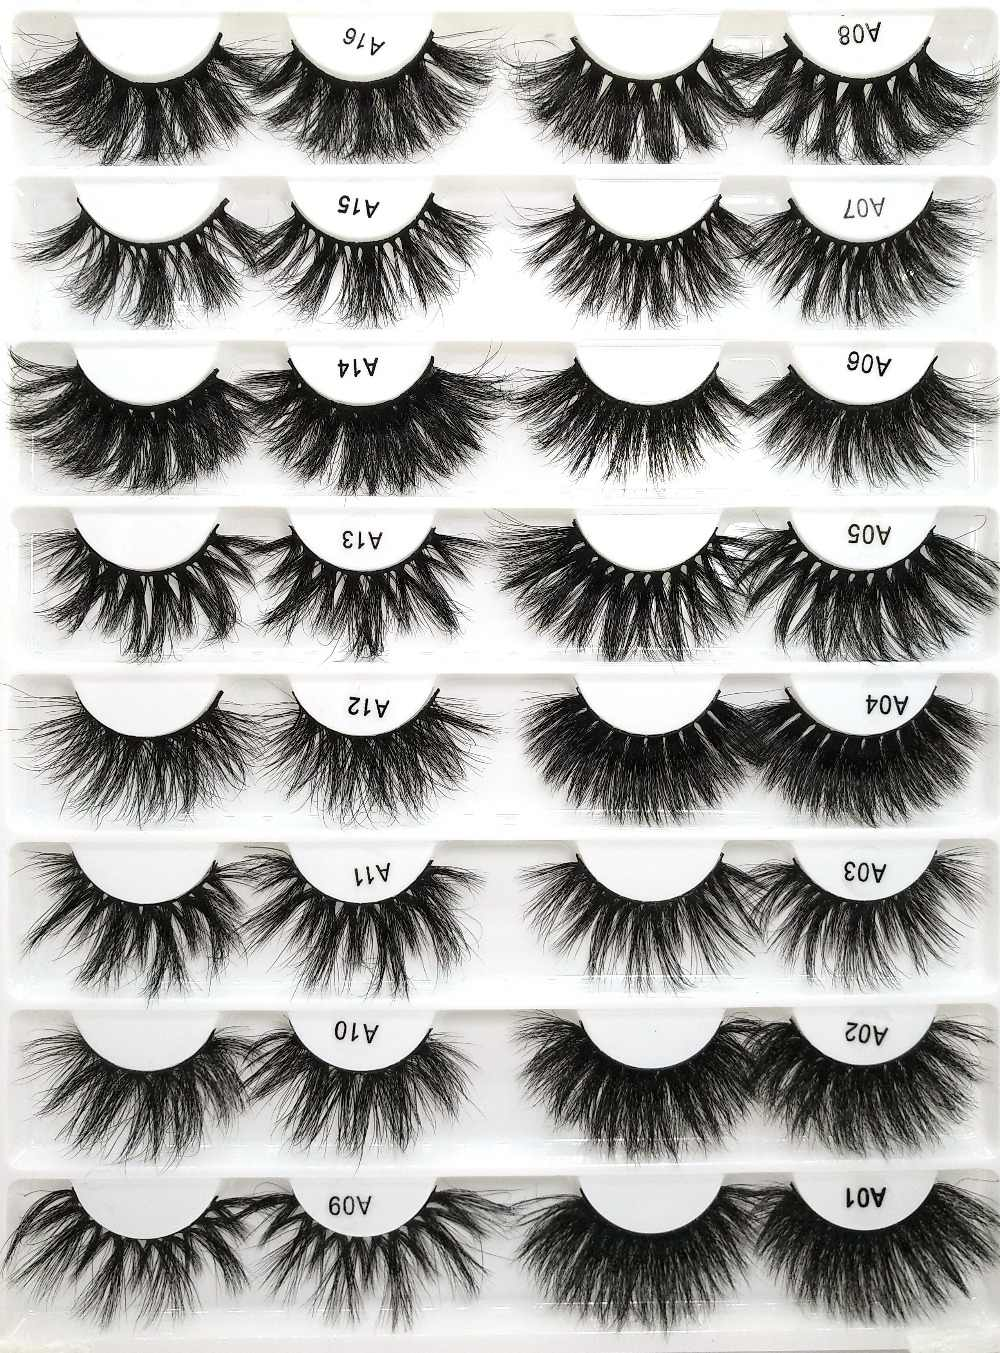 73ac590888d Length 25mm mink lashes extra Long 3Dmink eyelashes Big dramatic  Criss-cross Strands Lashes Natural